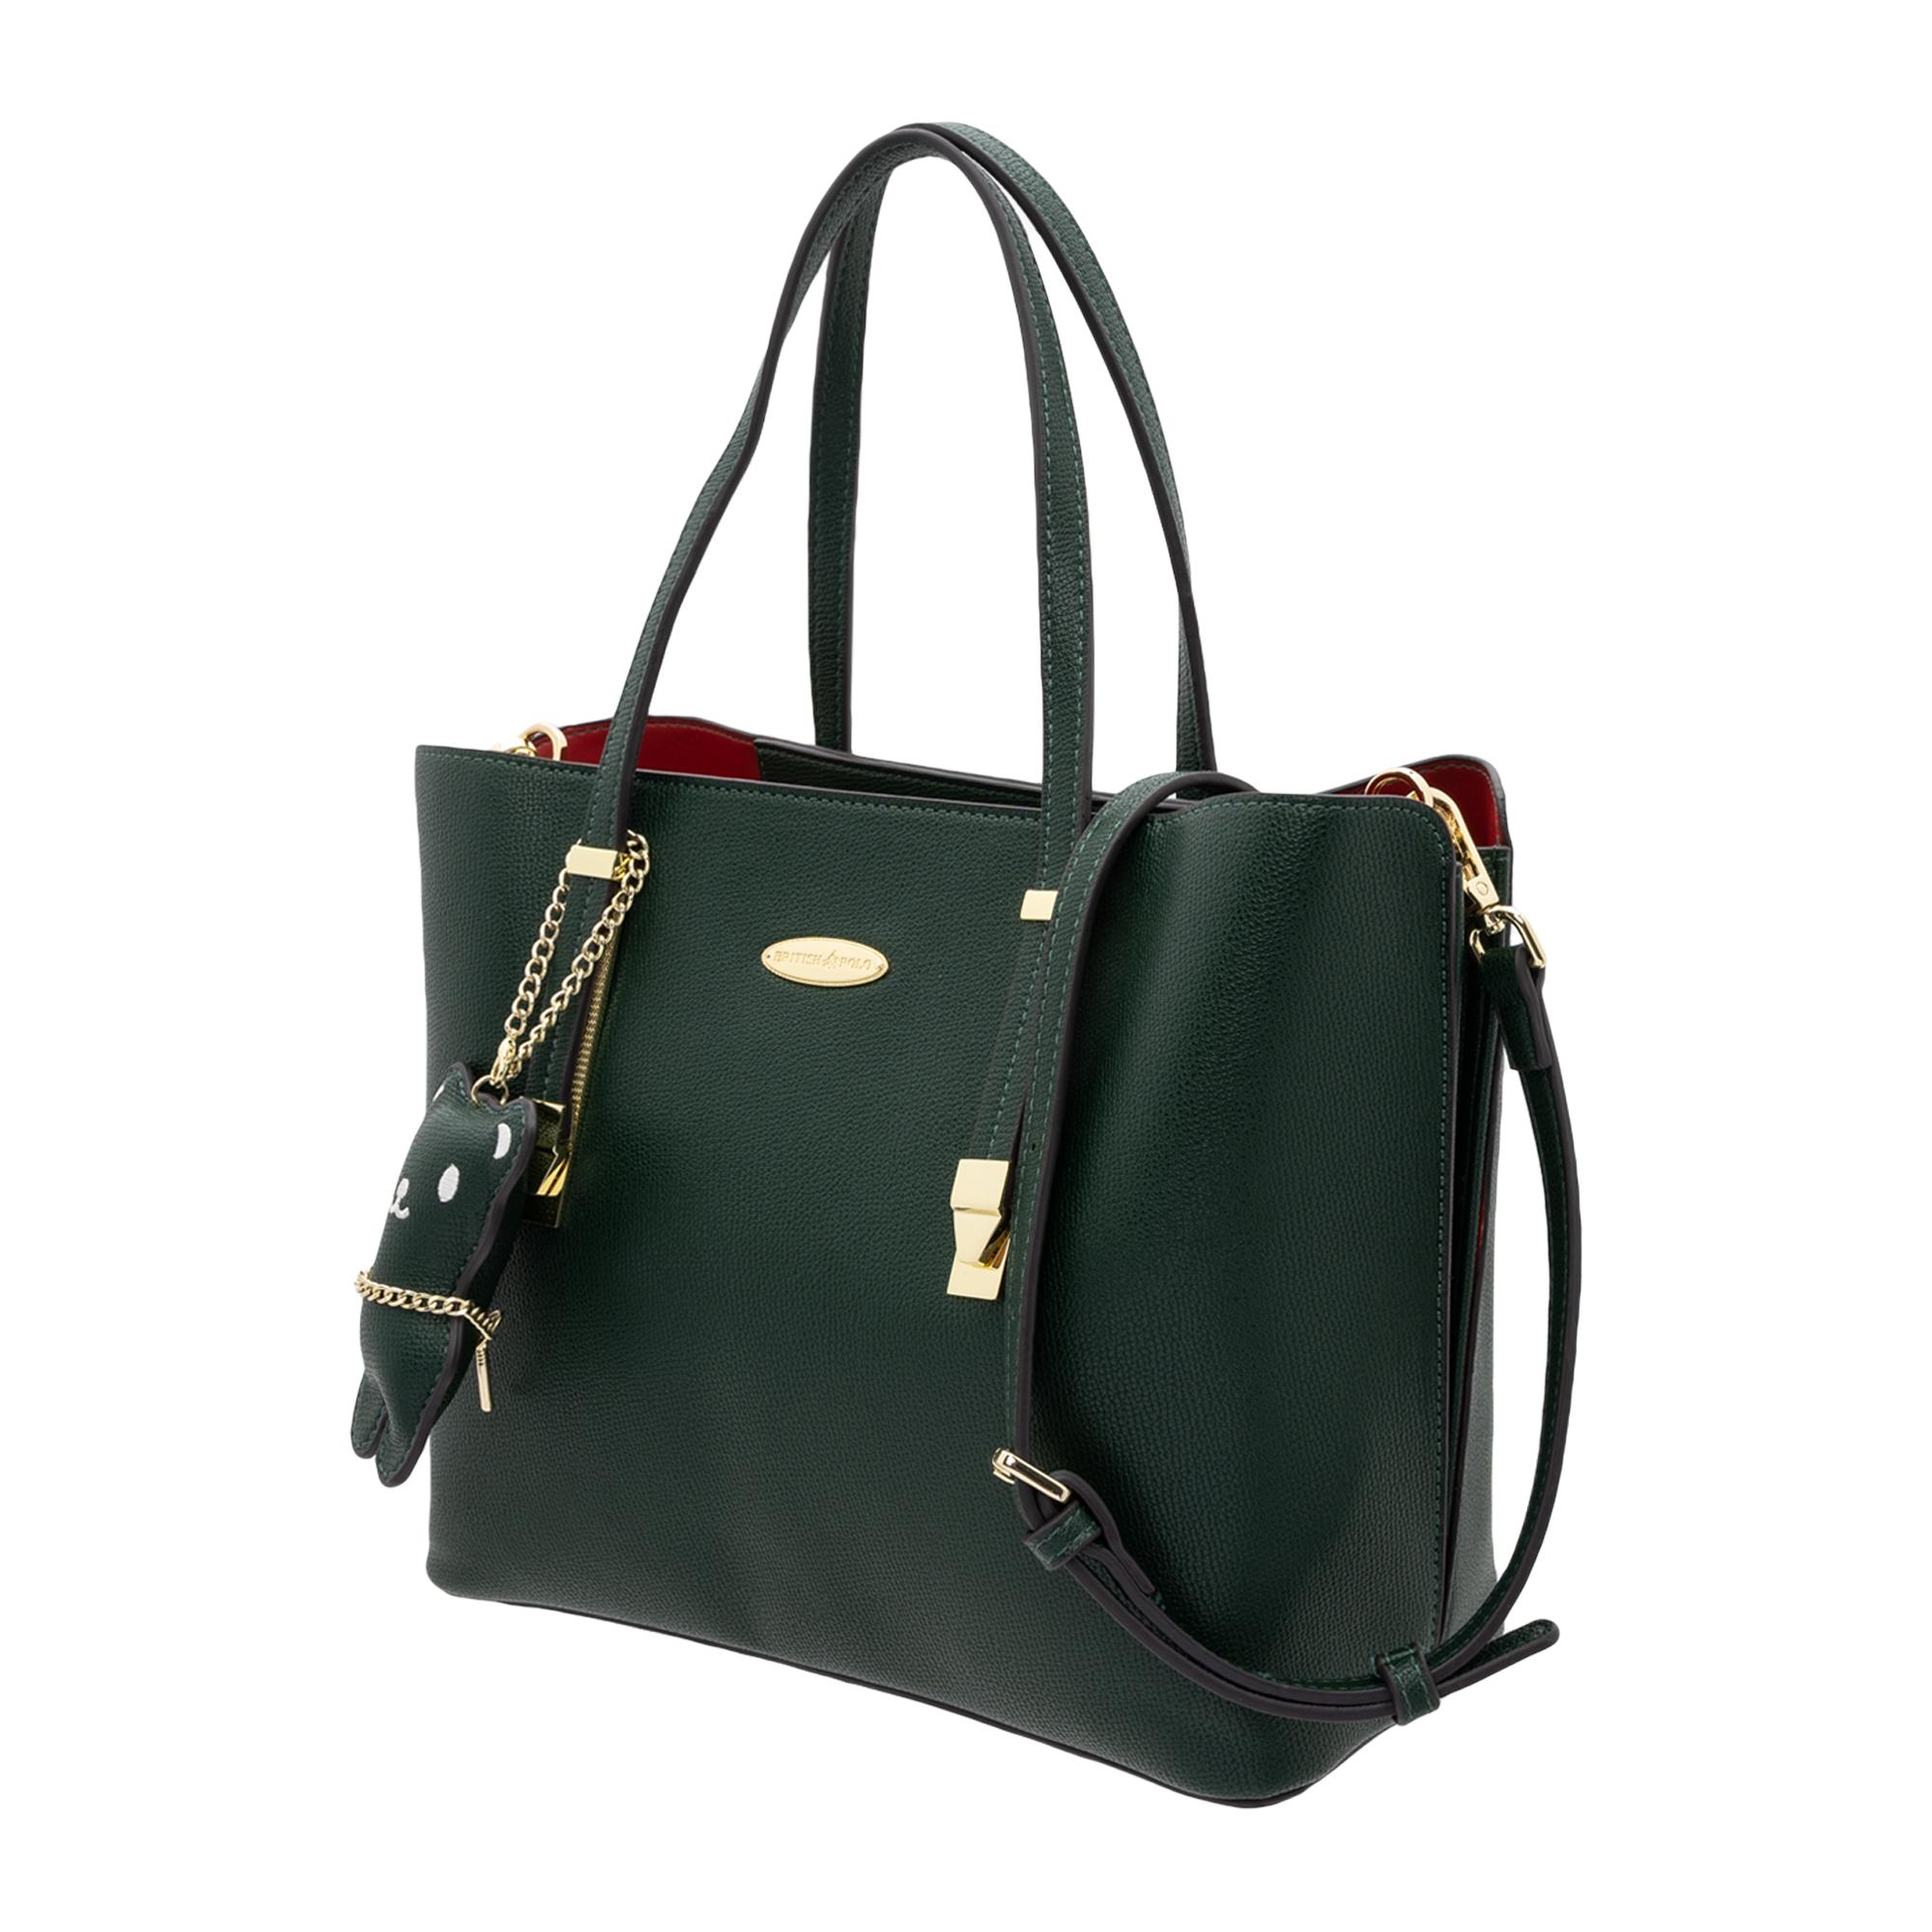 British Polo Bearly Cono Handle Bag